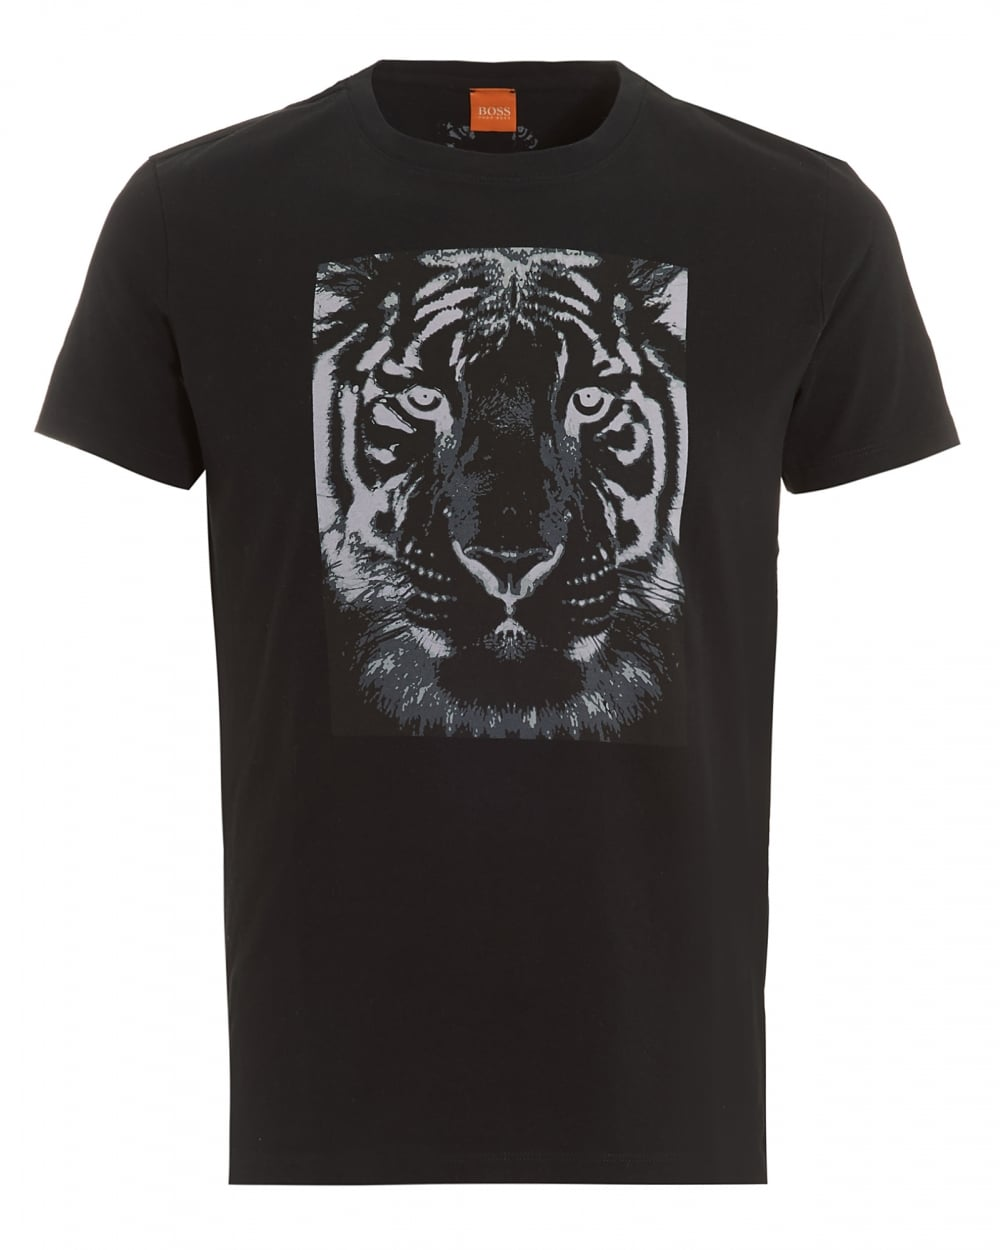 Mens Tullian 2 T-Shirt, Black Tiger Print Tee